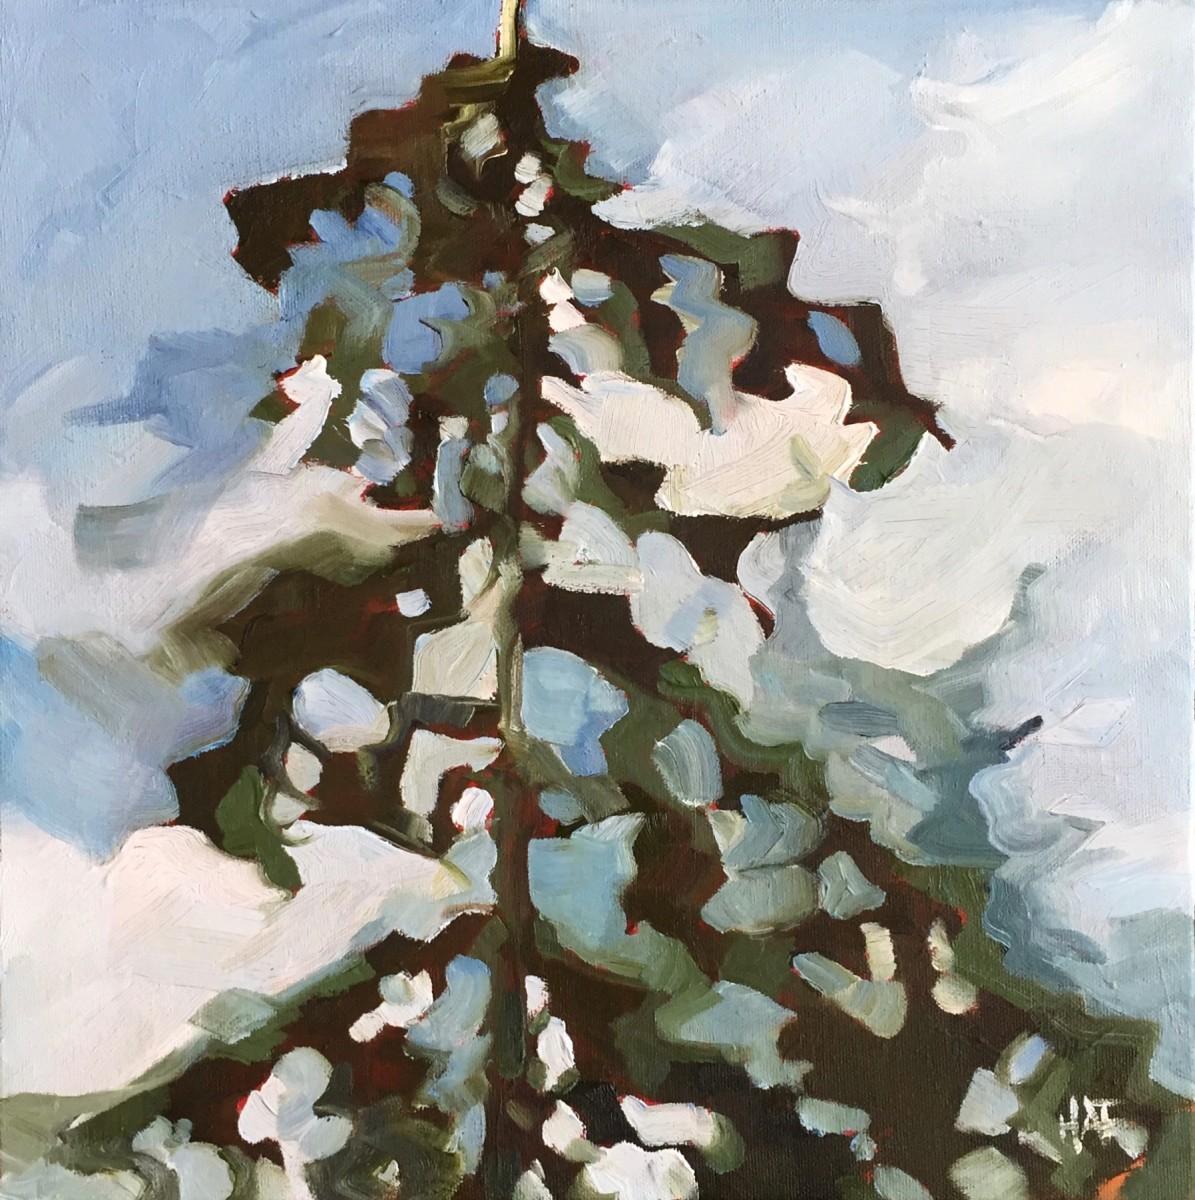 Upward Pine